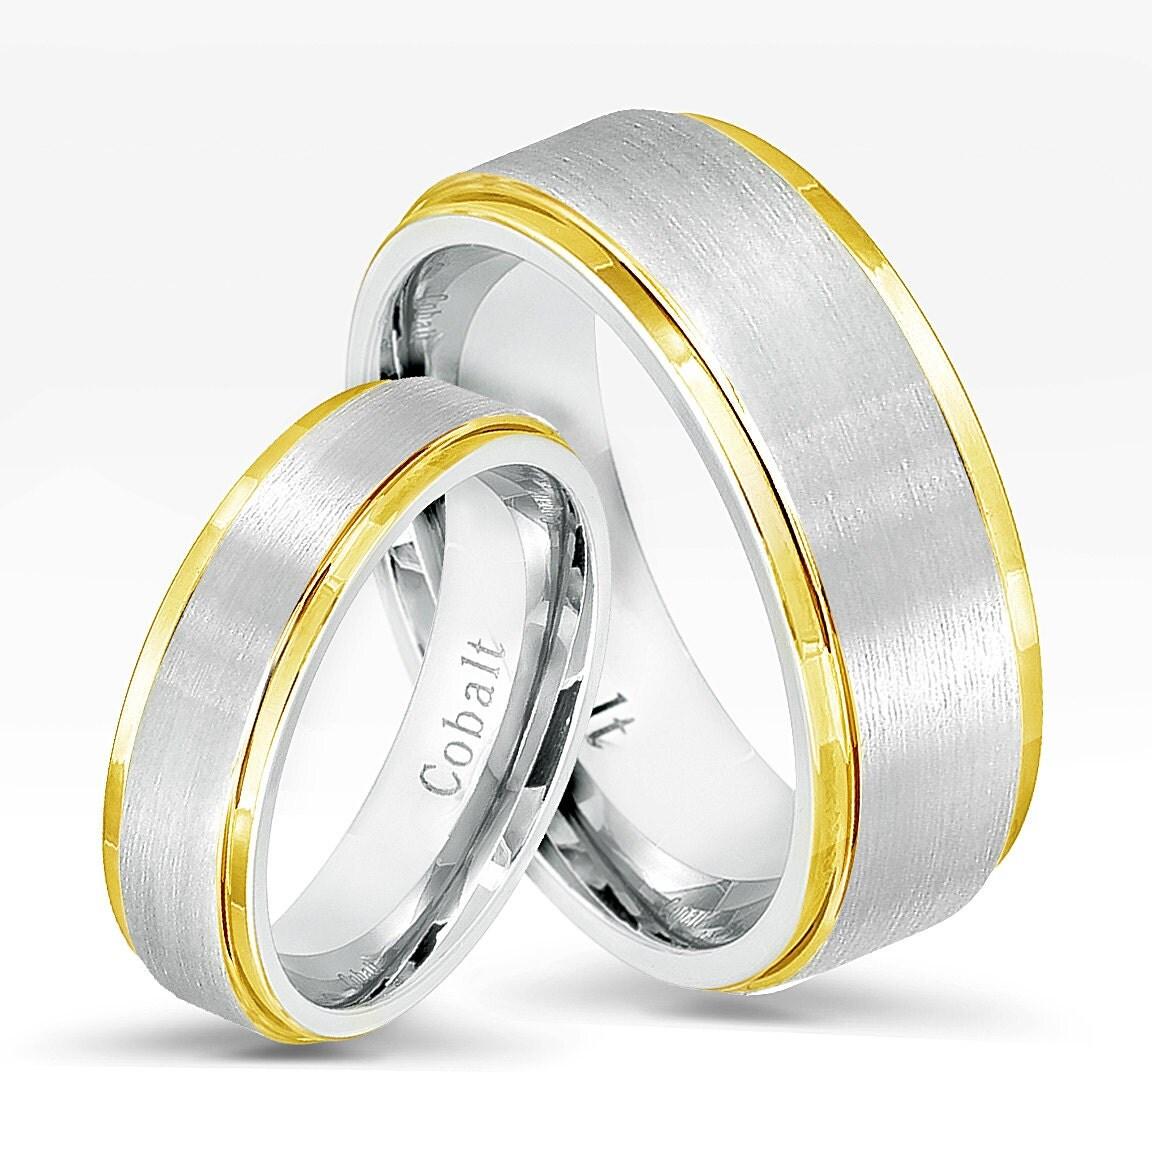 Two Tone Wedding Bands: 2-Tone Cobalt Wedding Band SetComfort Fit Wedding Bands 8mm